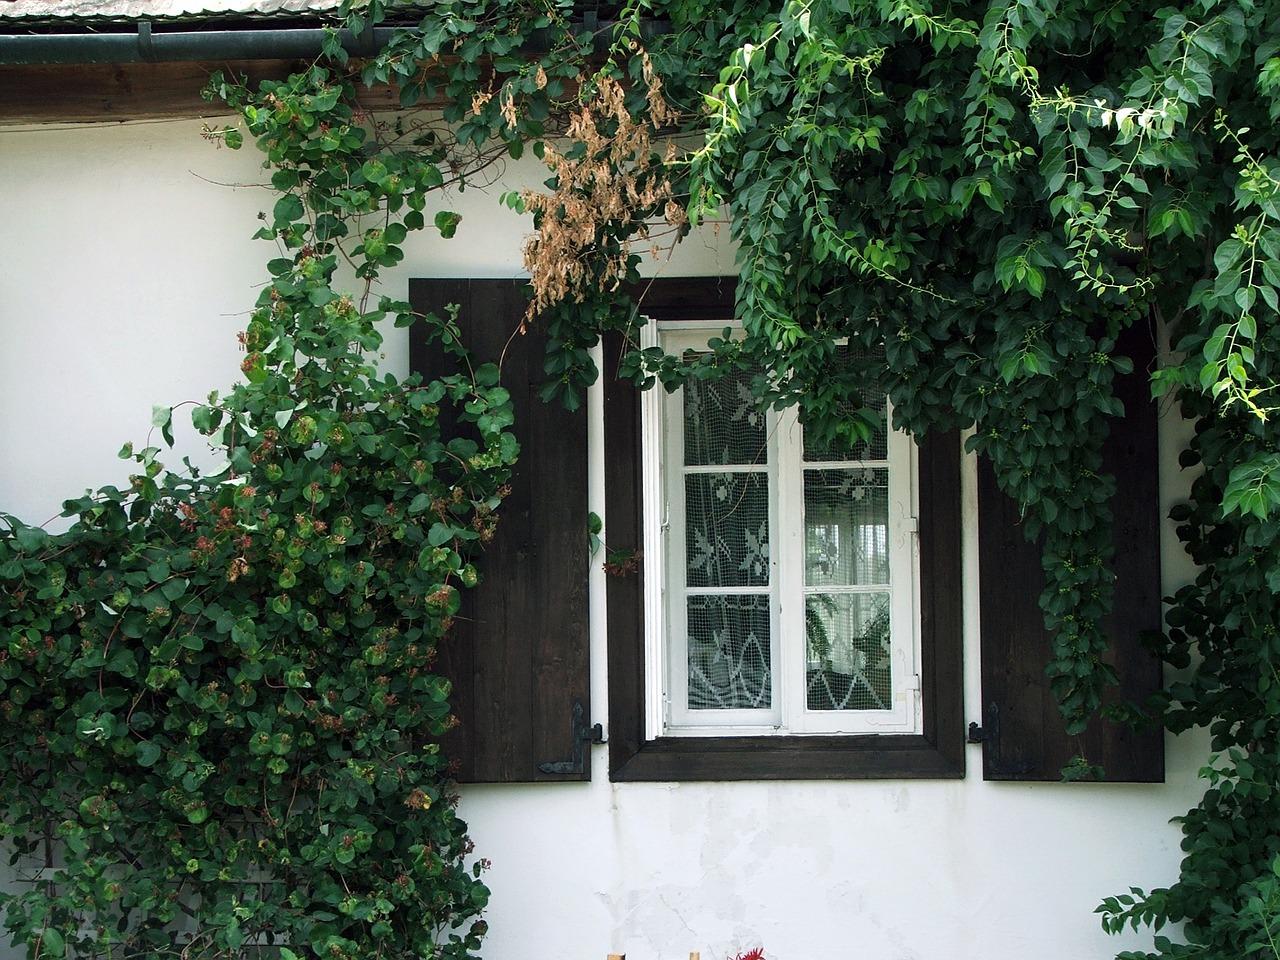 window-629800_1280